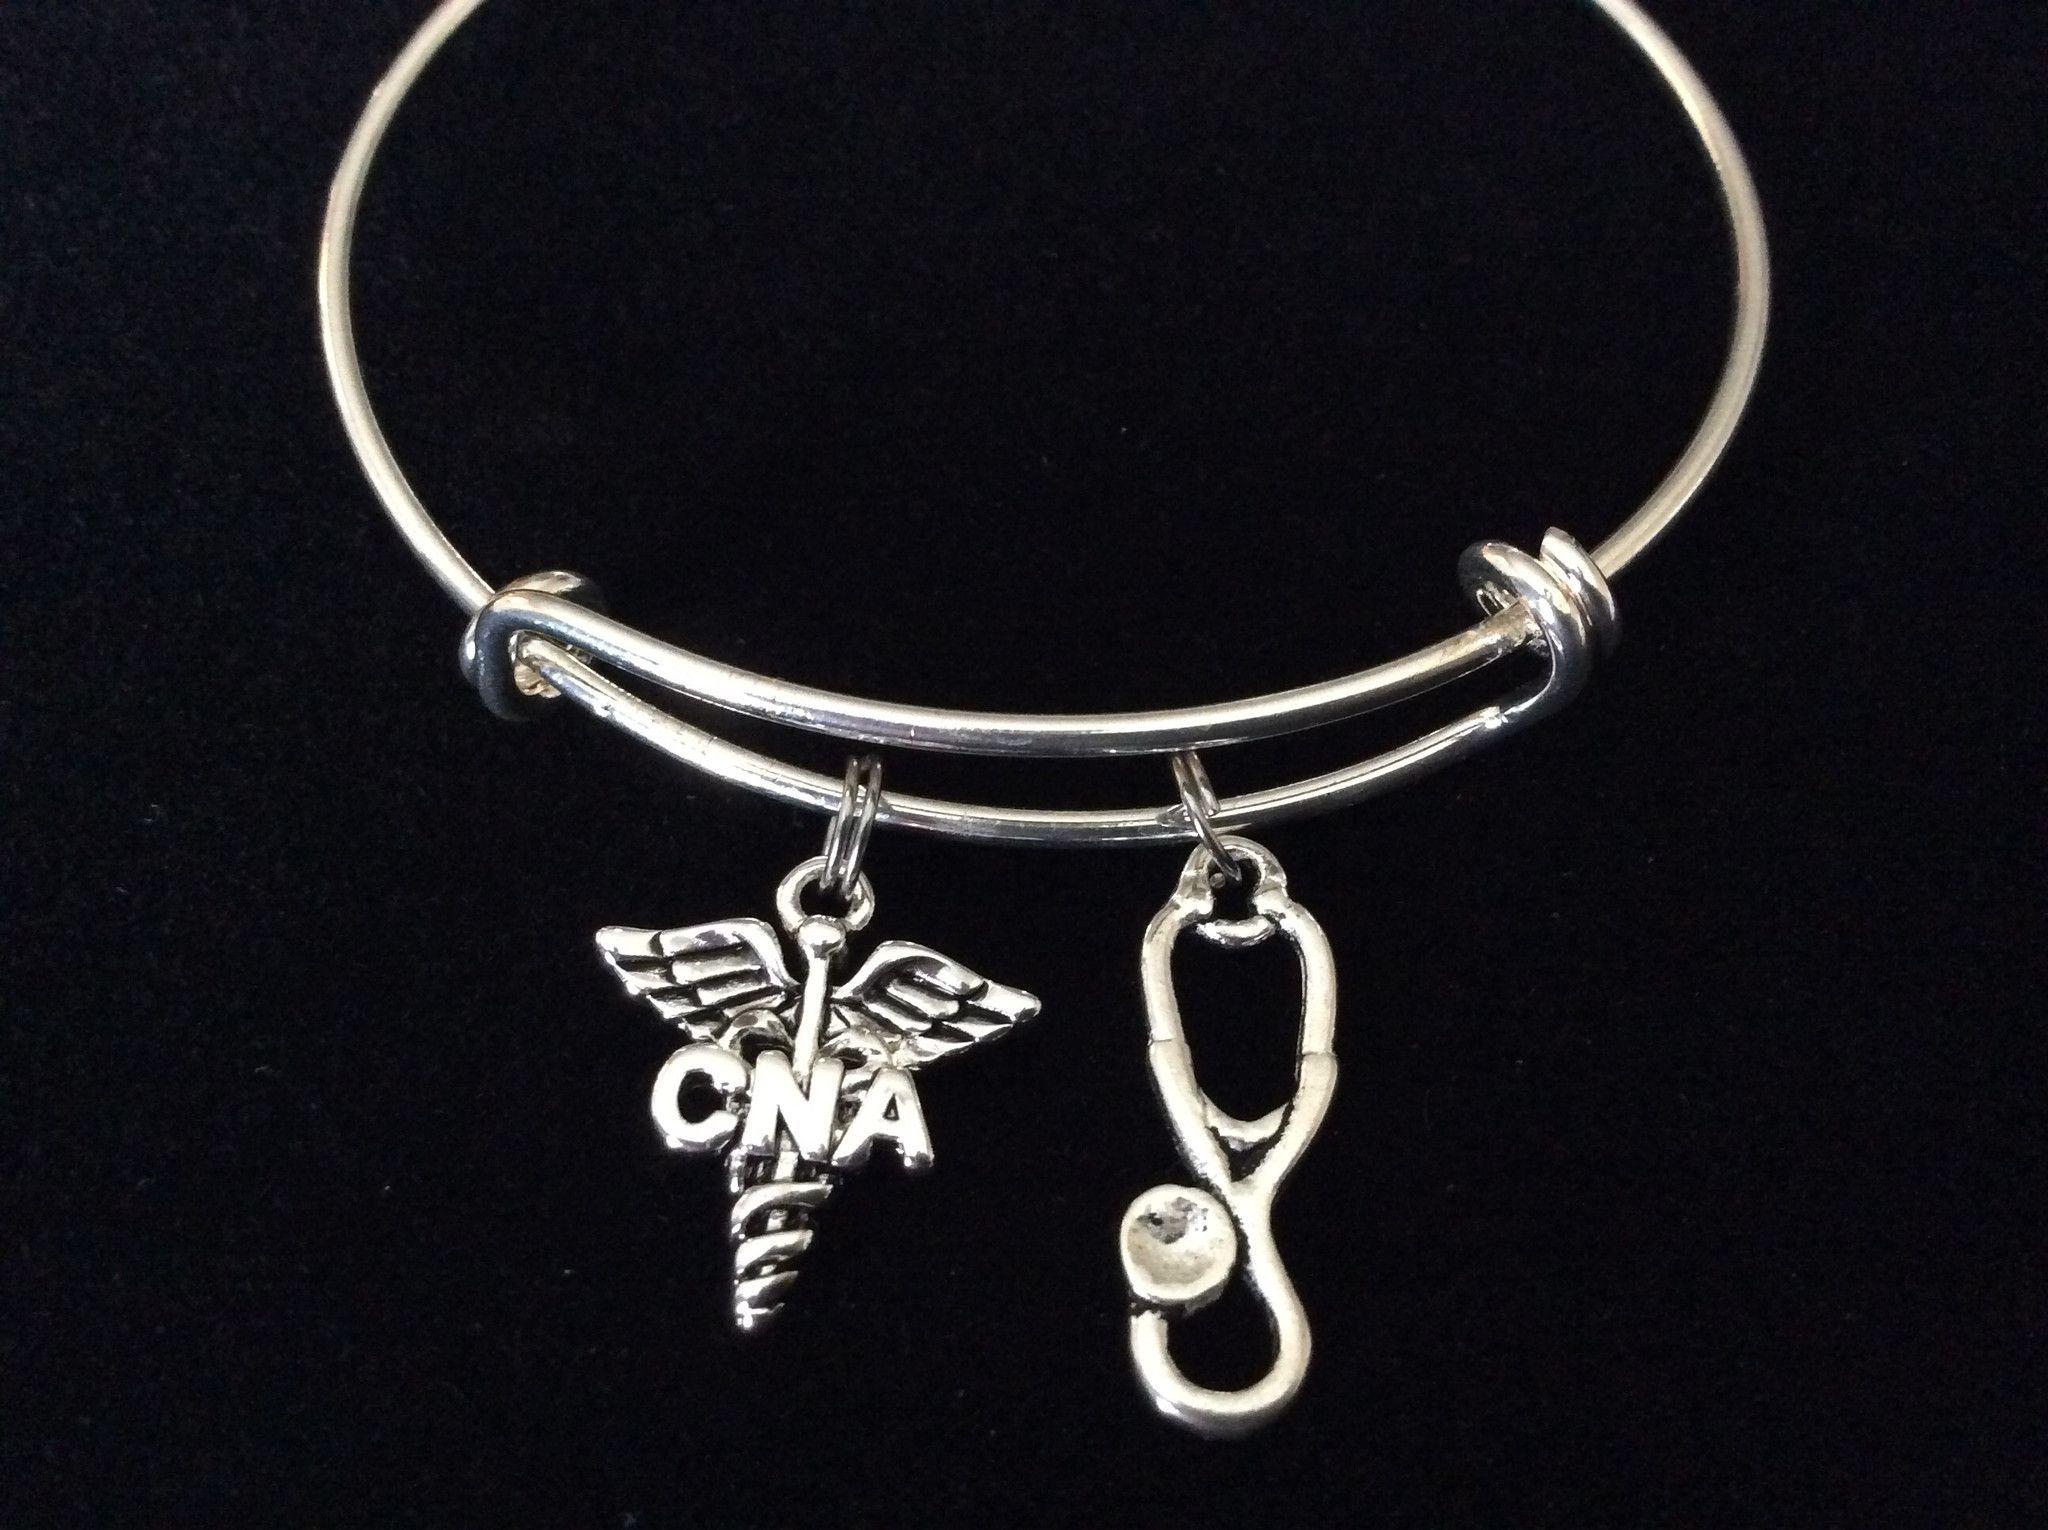 CNA Certified Nurse Assistant Silver Charm Bangle Bracelet